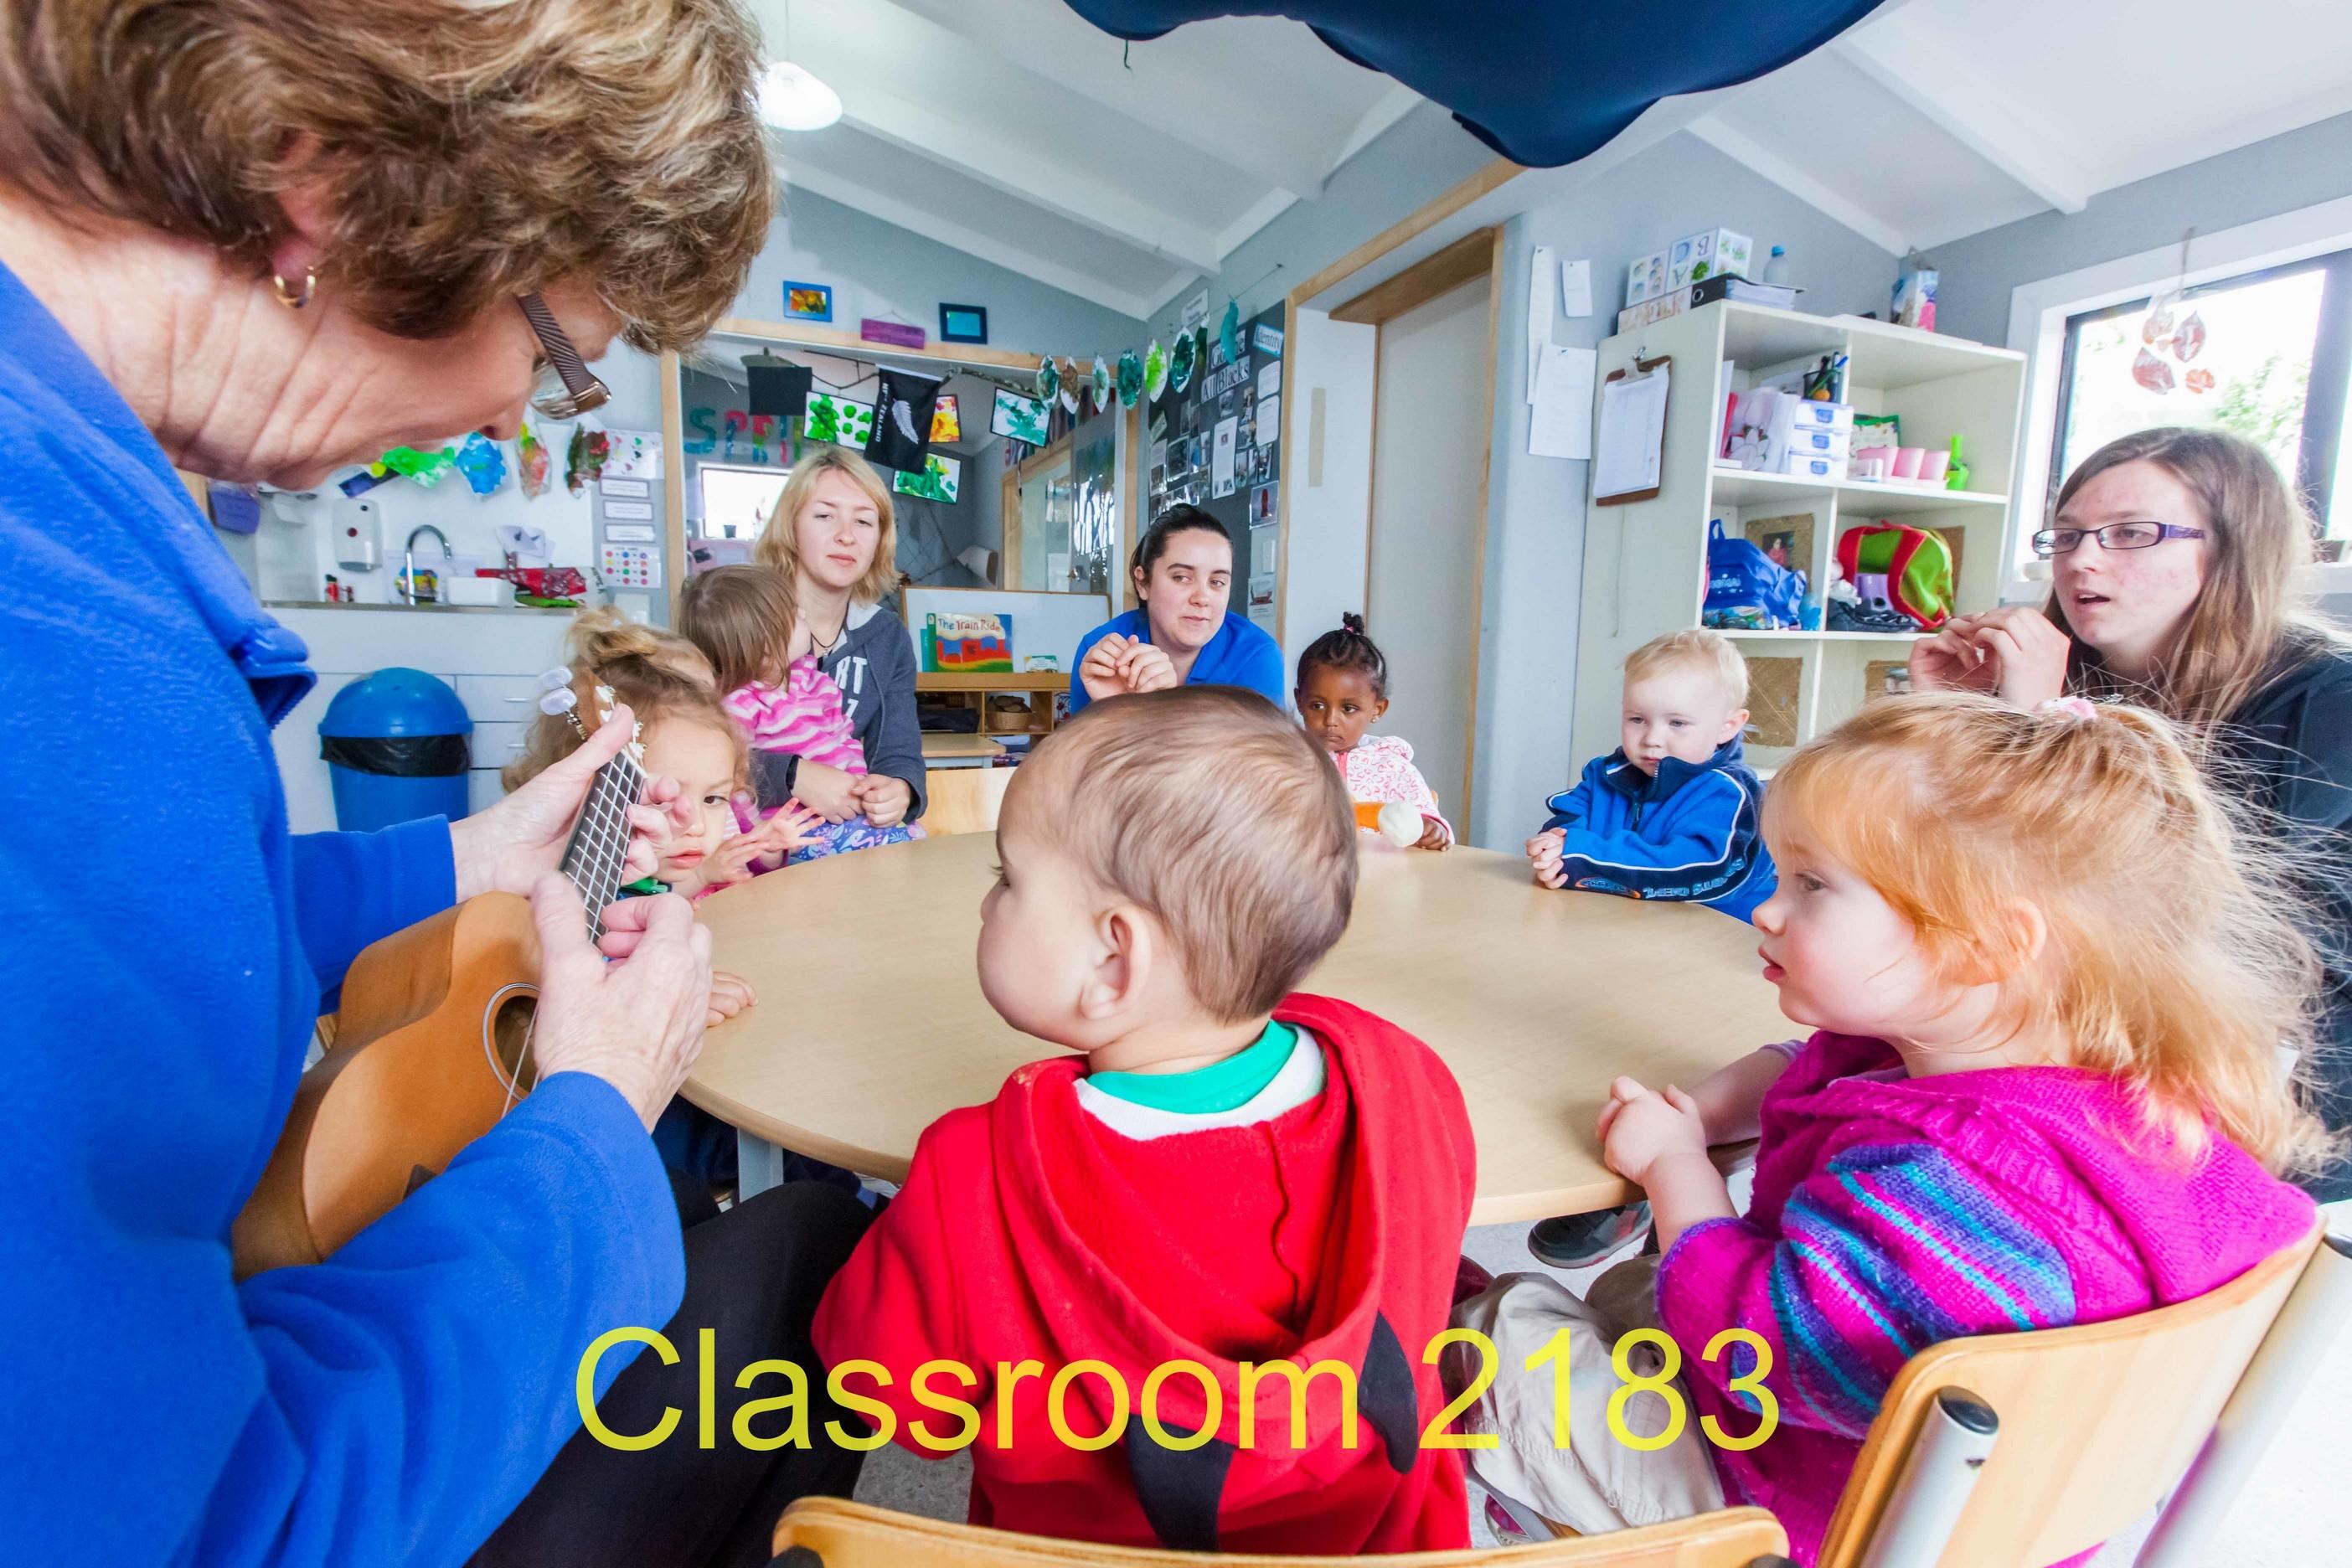 Classroom 2183